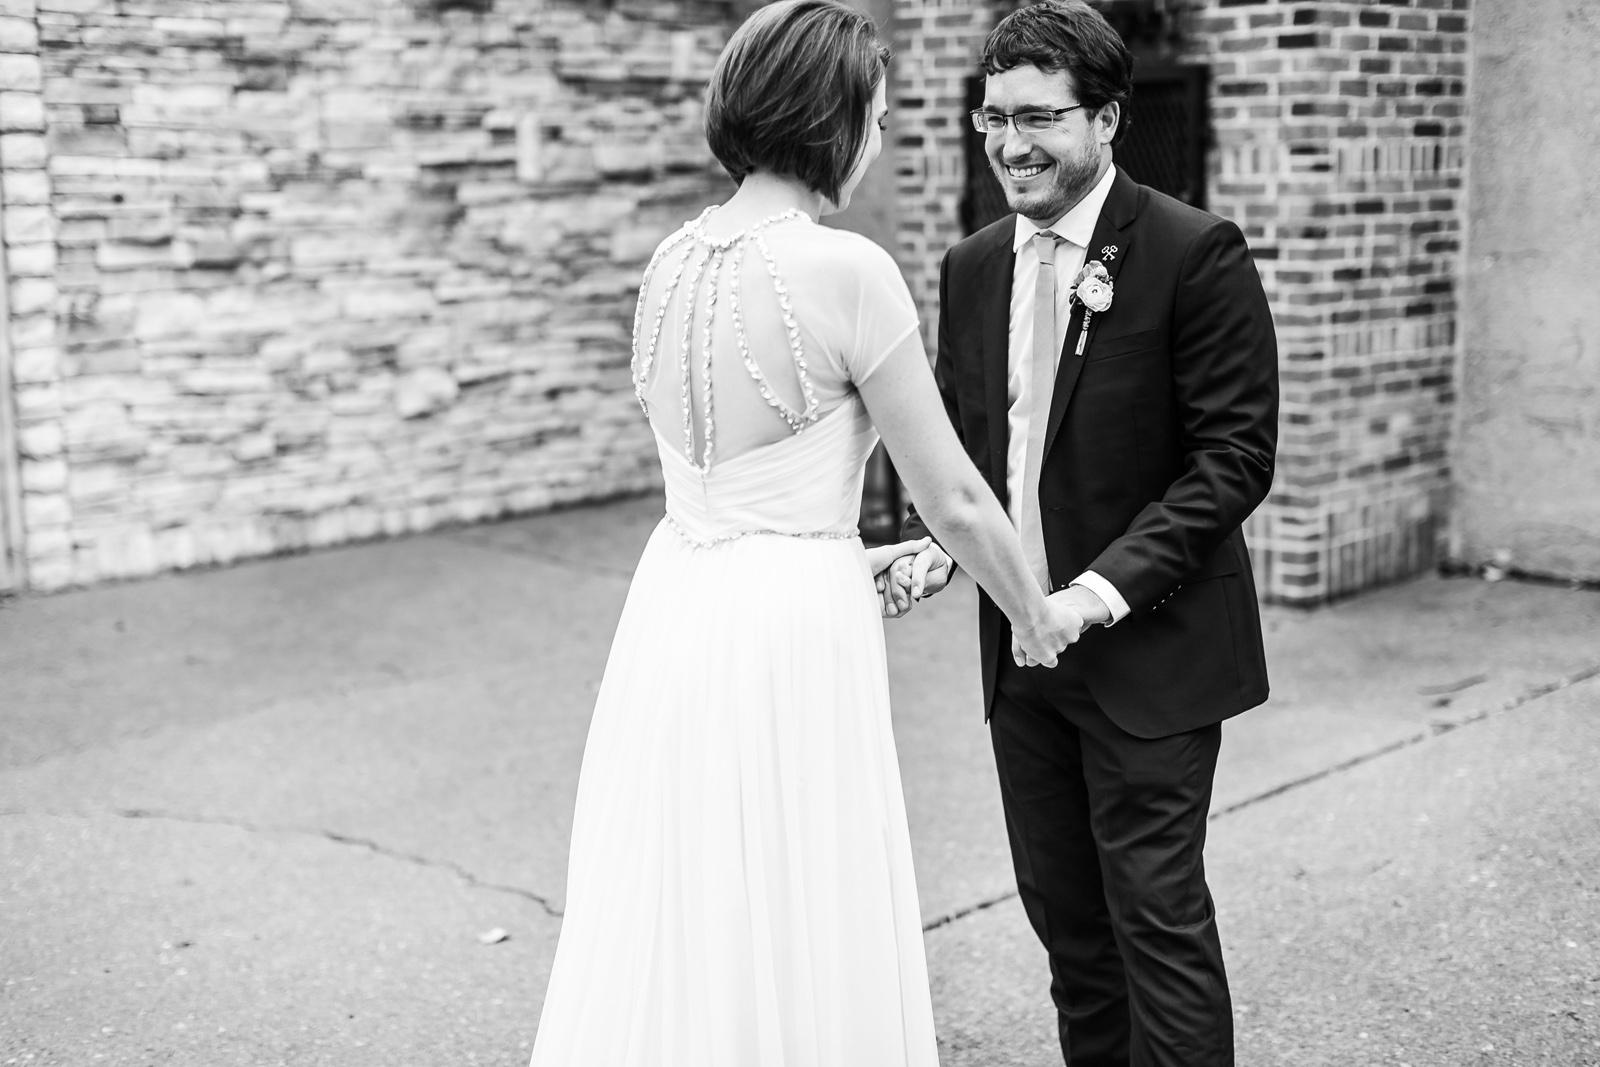 Oldani Photography-St Louis-Wedding Photos-wedding photographer-First Look-Mad Art Gallery_20141122_14375336.jpg